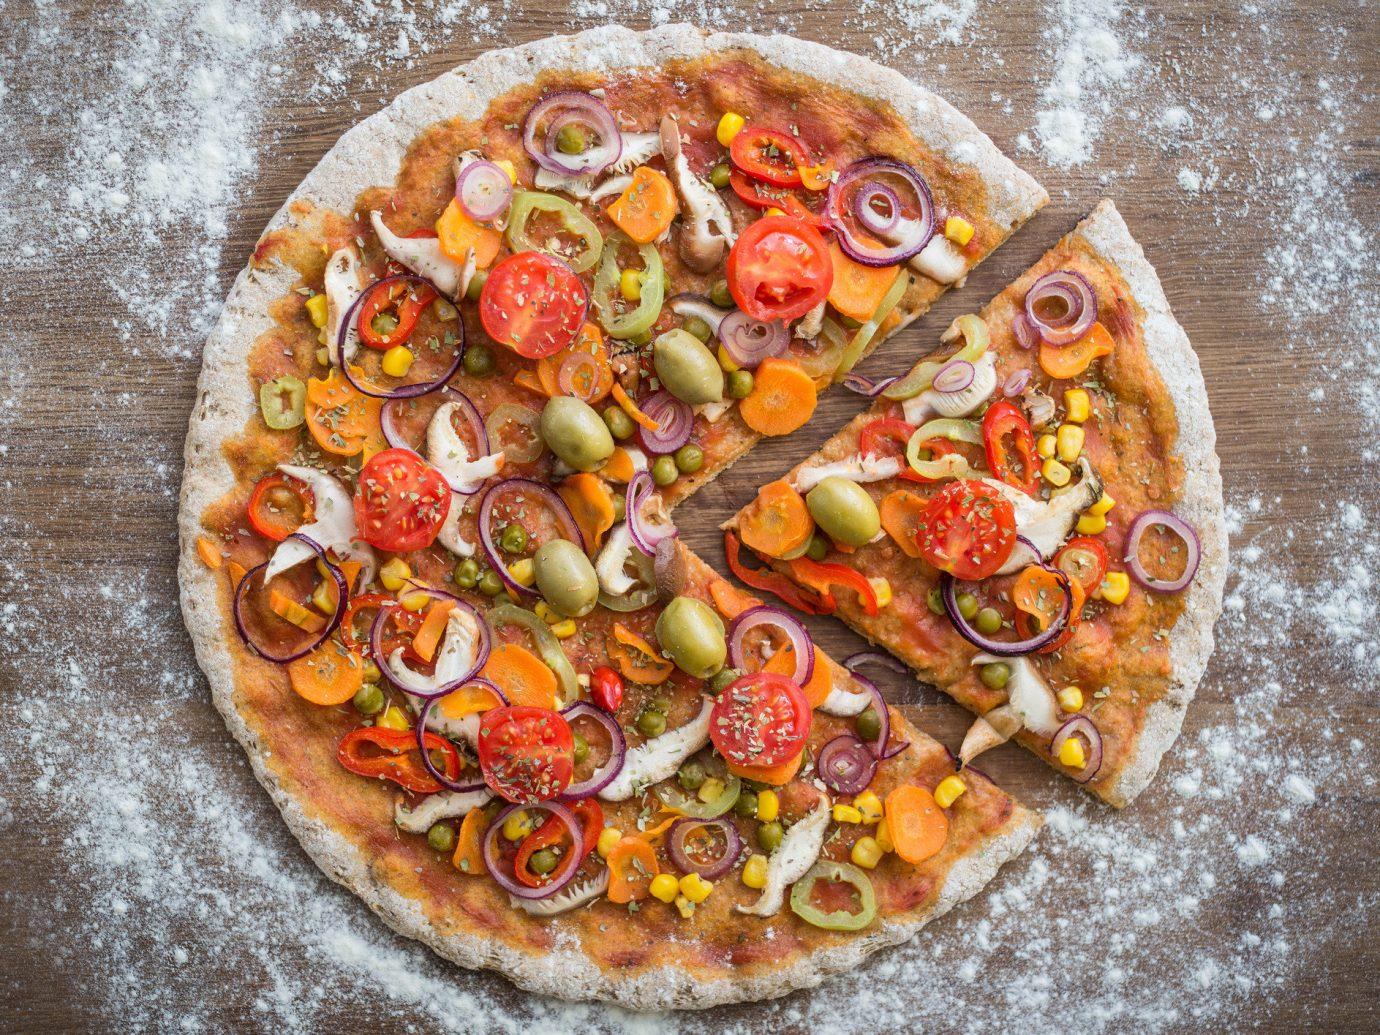 Family Travel Food + Drink Trip Ideas Weekend Getaways food dish pizza cuisine italian food produce european food vegetable toppings sliced